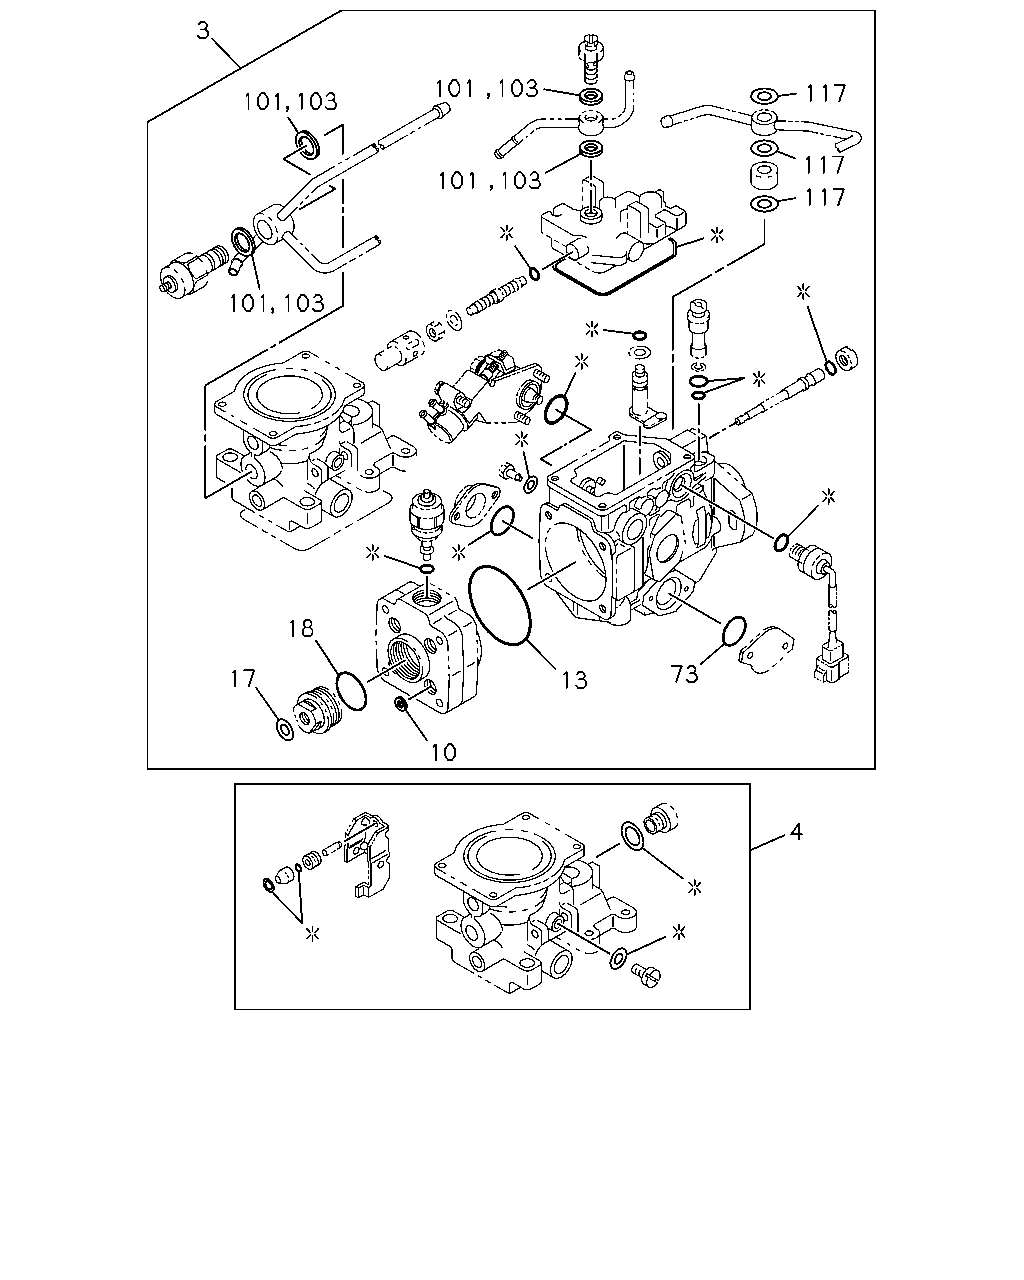 N 50693 Nhr 94 98 0 Engine Emission Electrical F 117 Diagram Parts